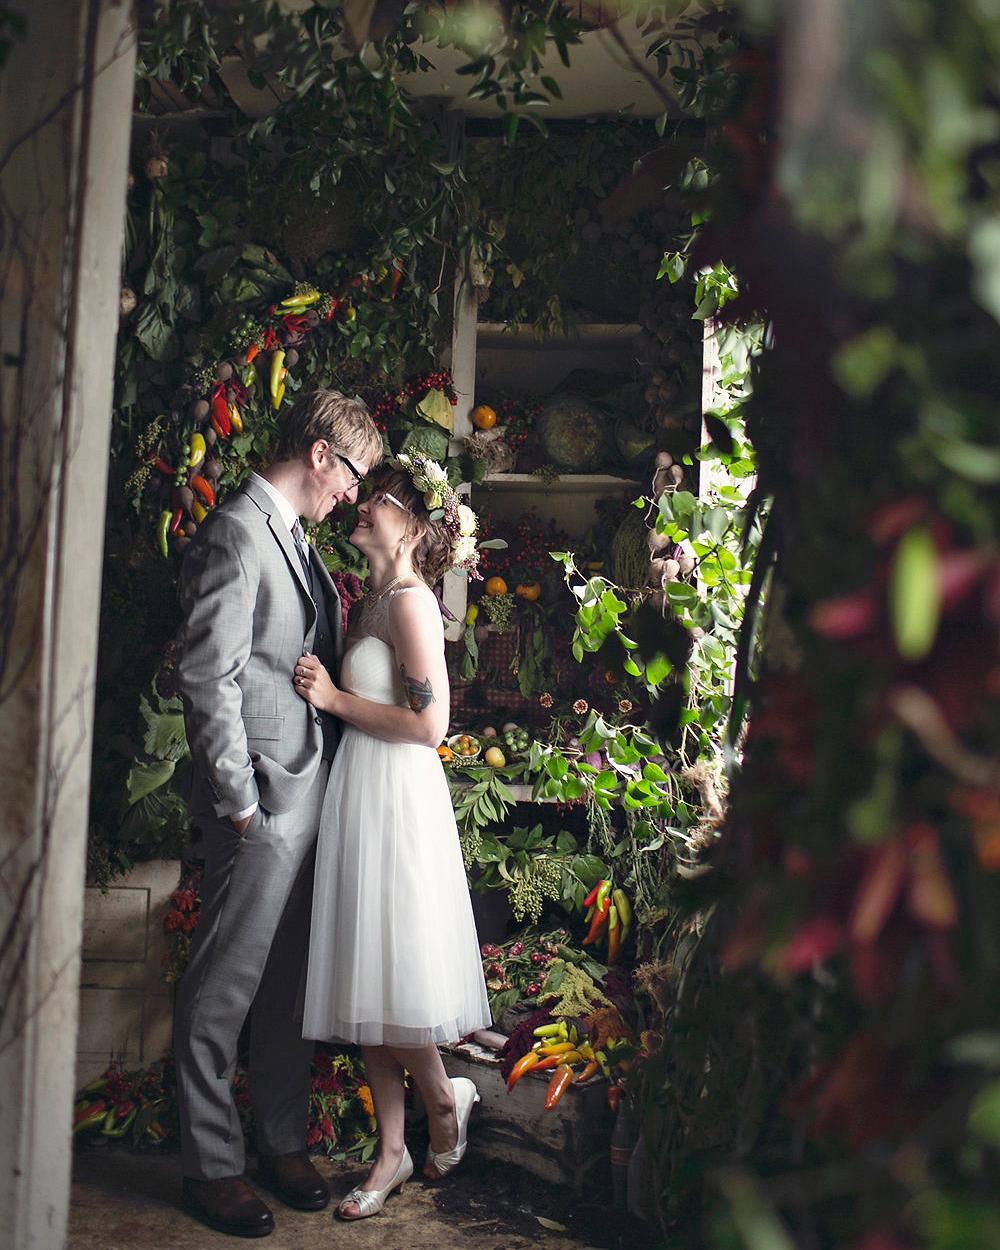 kristen-steve-flowerhouse-wedding-couple-6155-s113059-0616.jpg